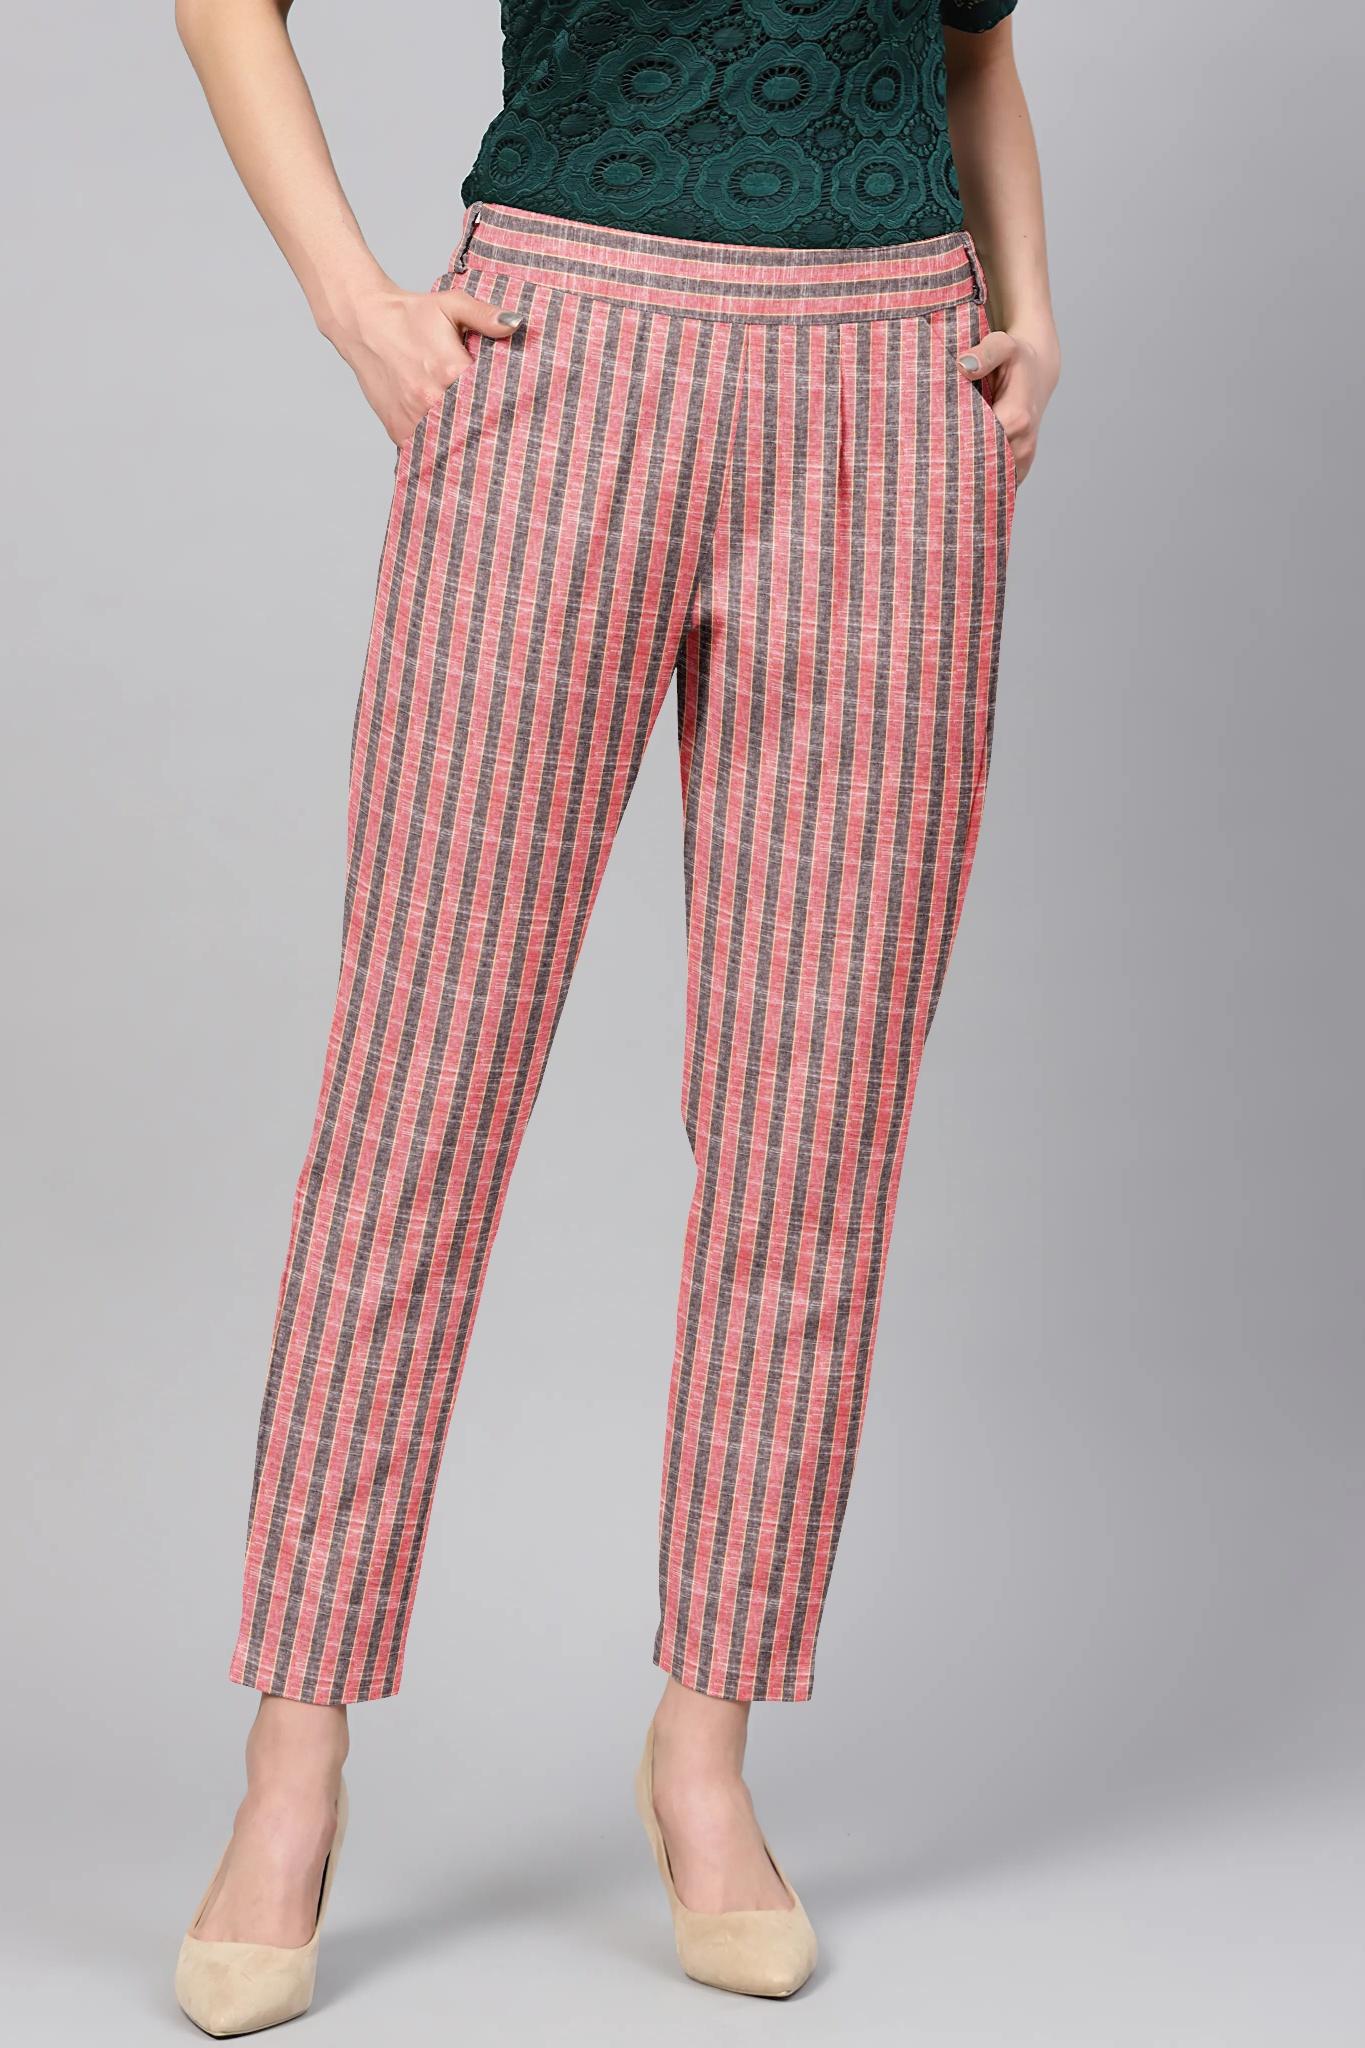 /home/customer/www/fabartcraft.com/public_html/uploadshttps://www.shopolics.com/uploads/images/medium/Peach-Gray-Cotton-Stripe-Regular-Fit-Solid-Trouser-36107.jpg